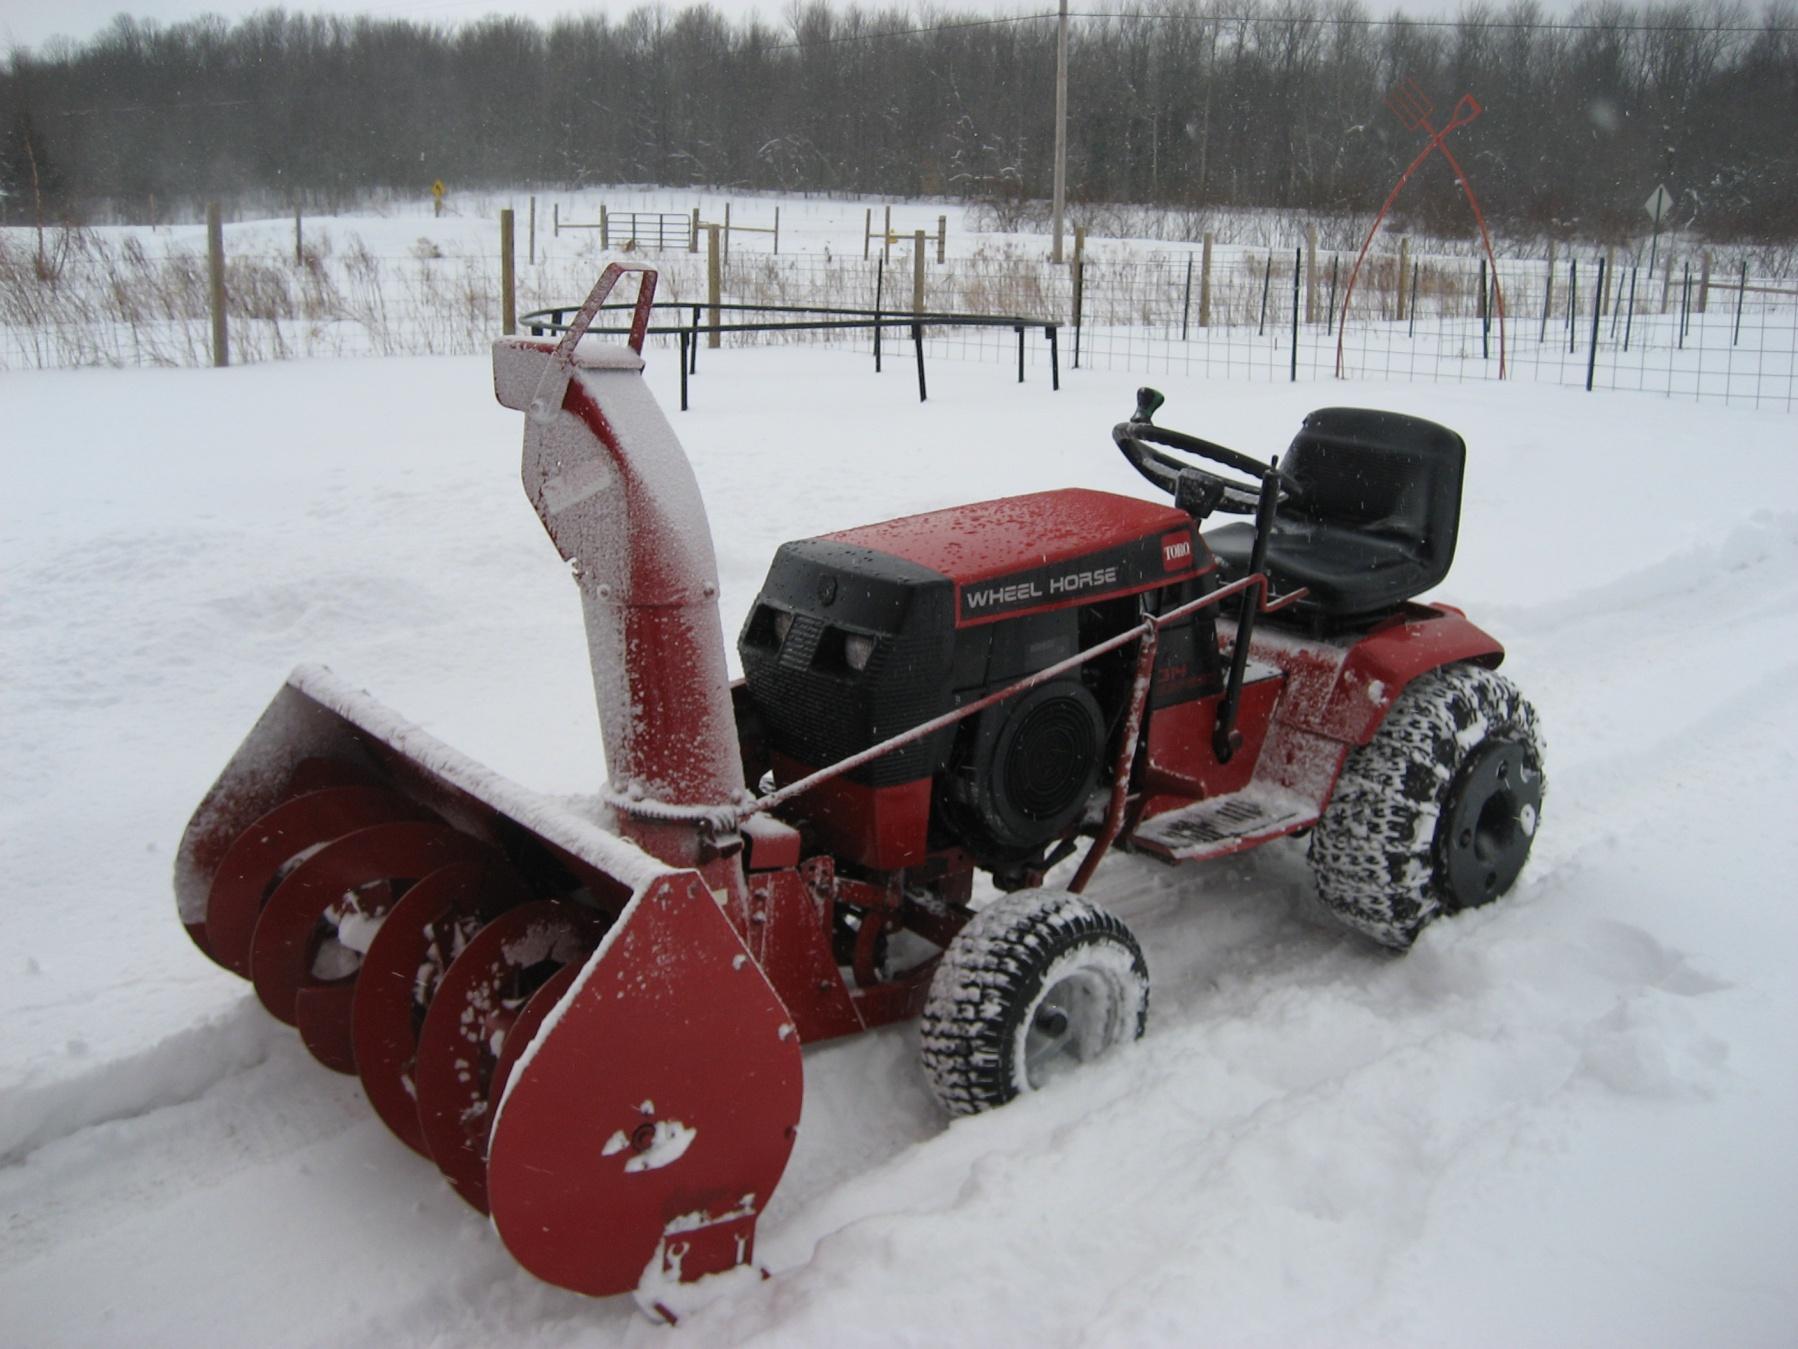 Wheelhorse 314-h parts manual for model 73403.